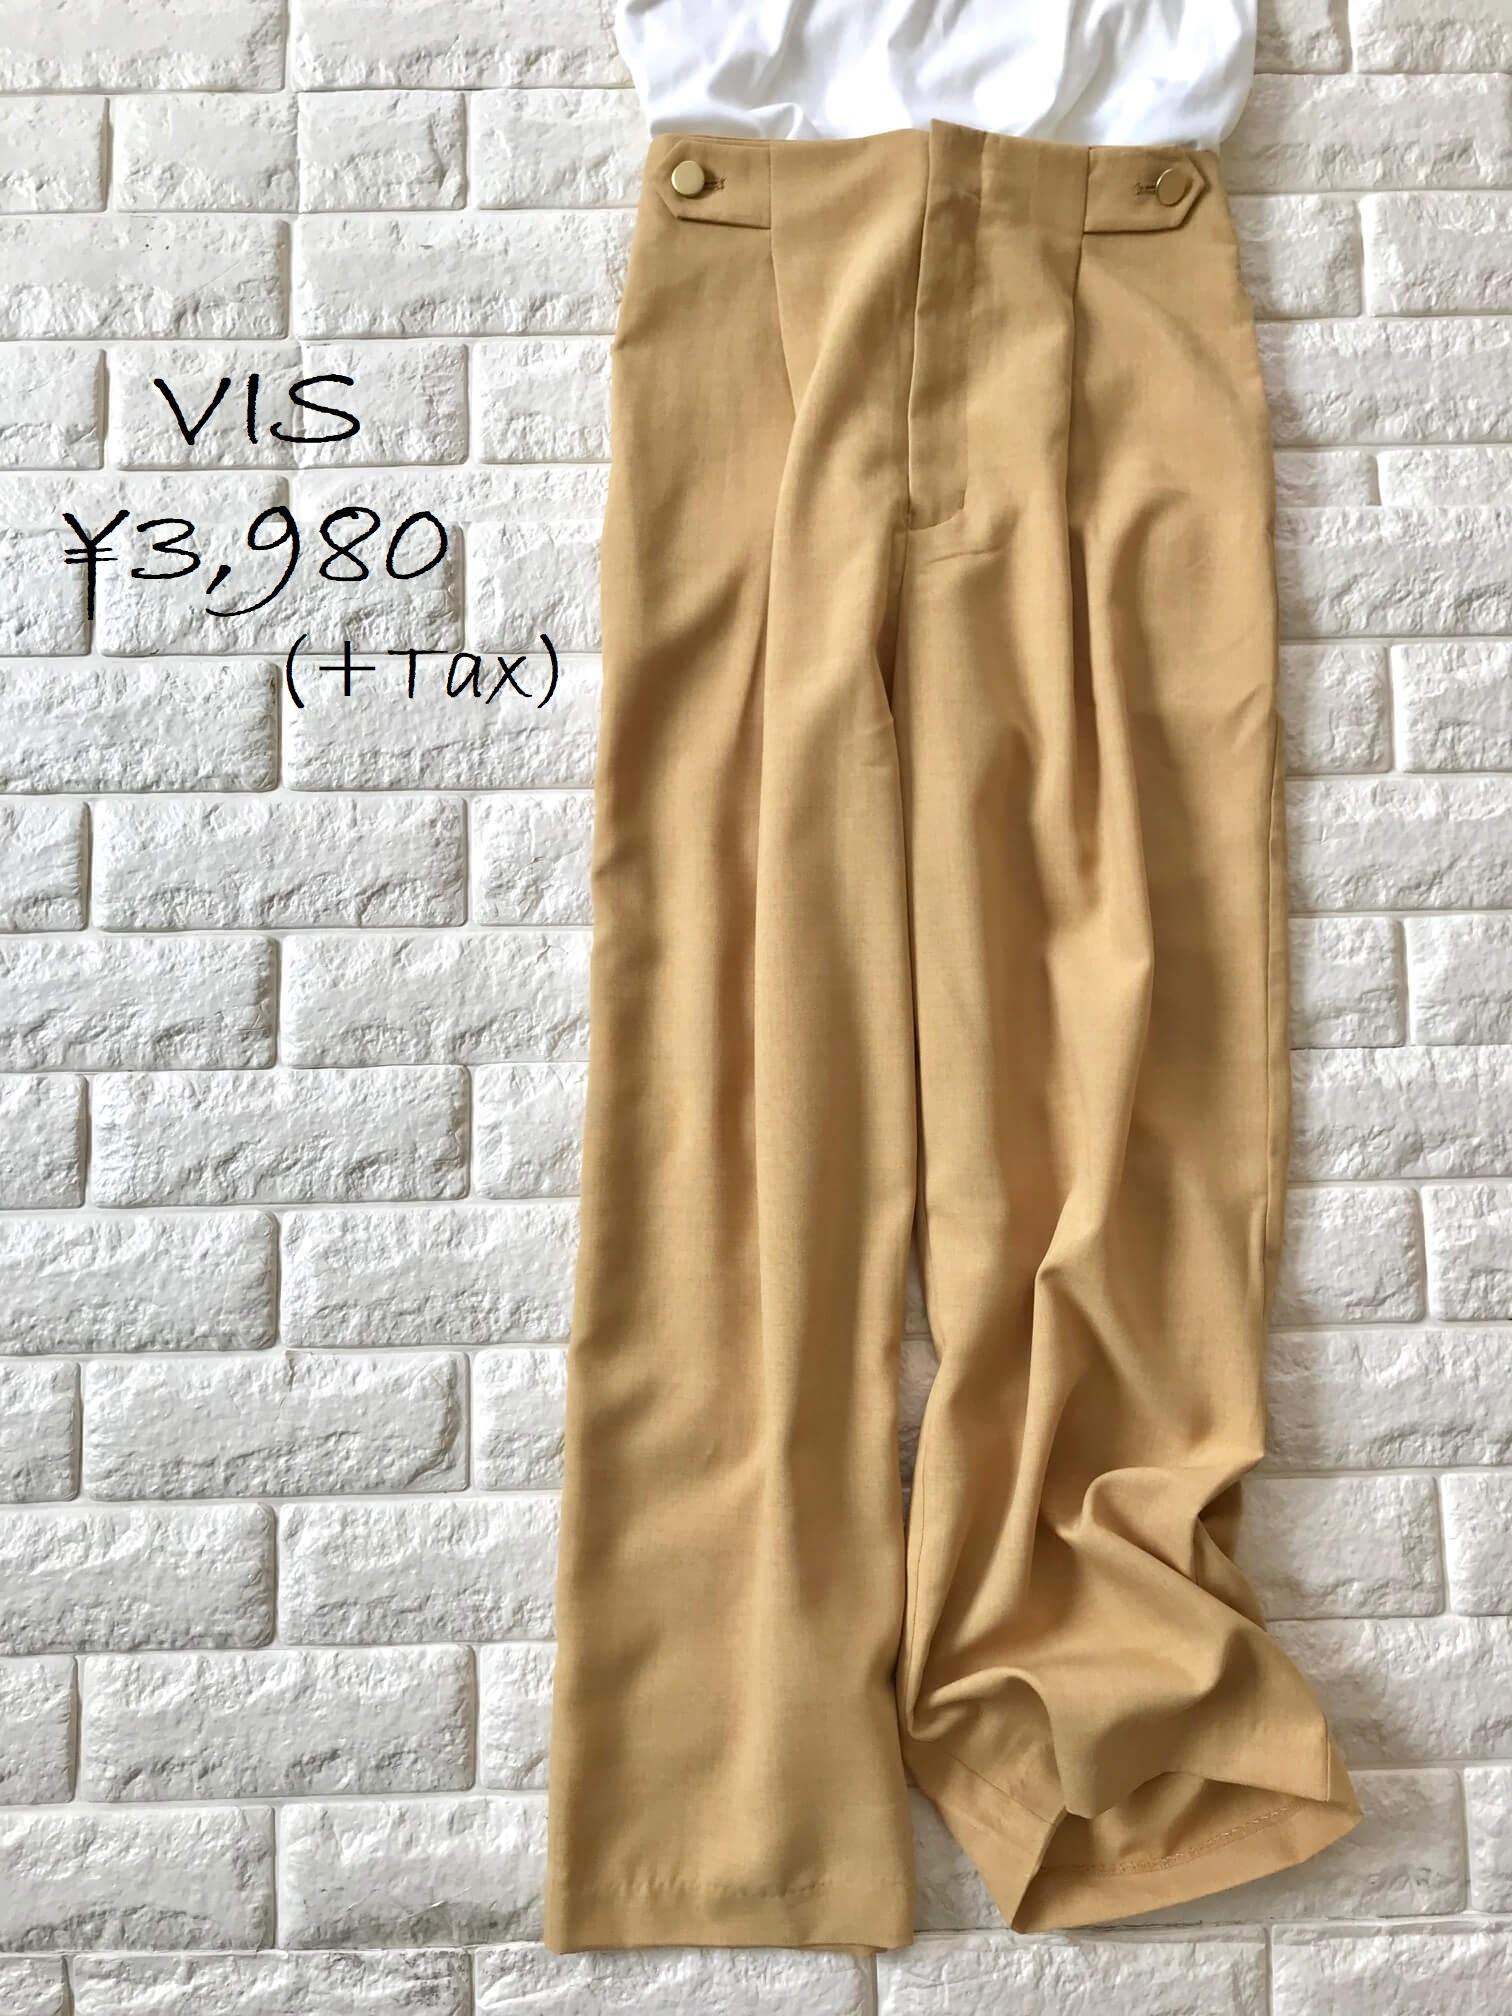 VISのカラシ色パンツ画像